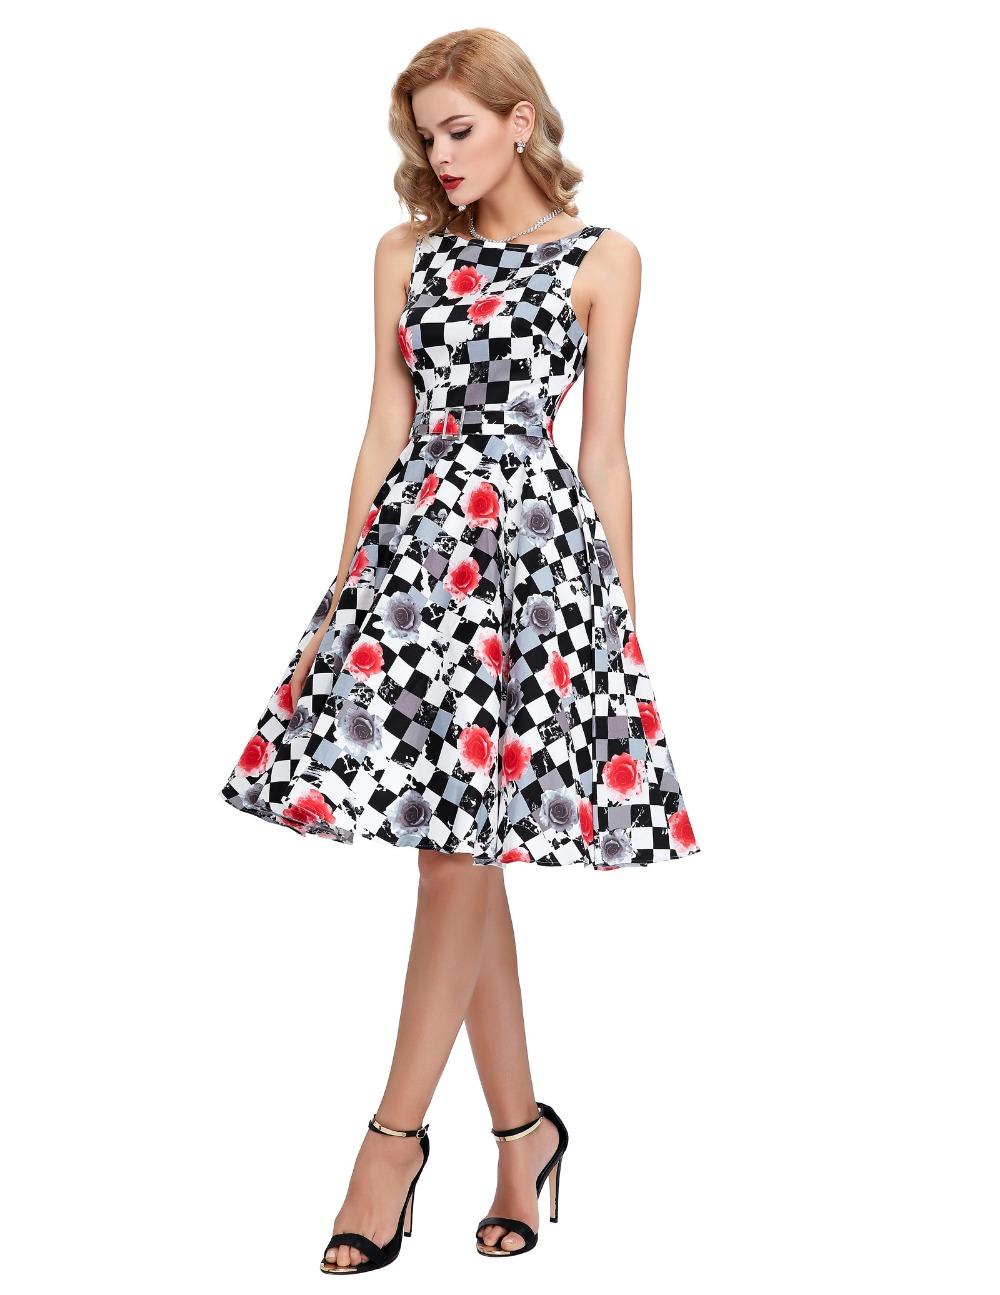 Retro Summer Dresses | Dress images